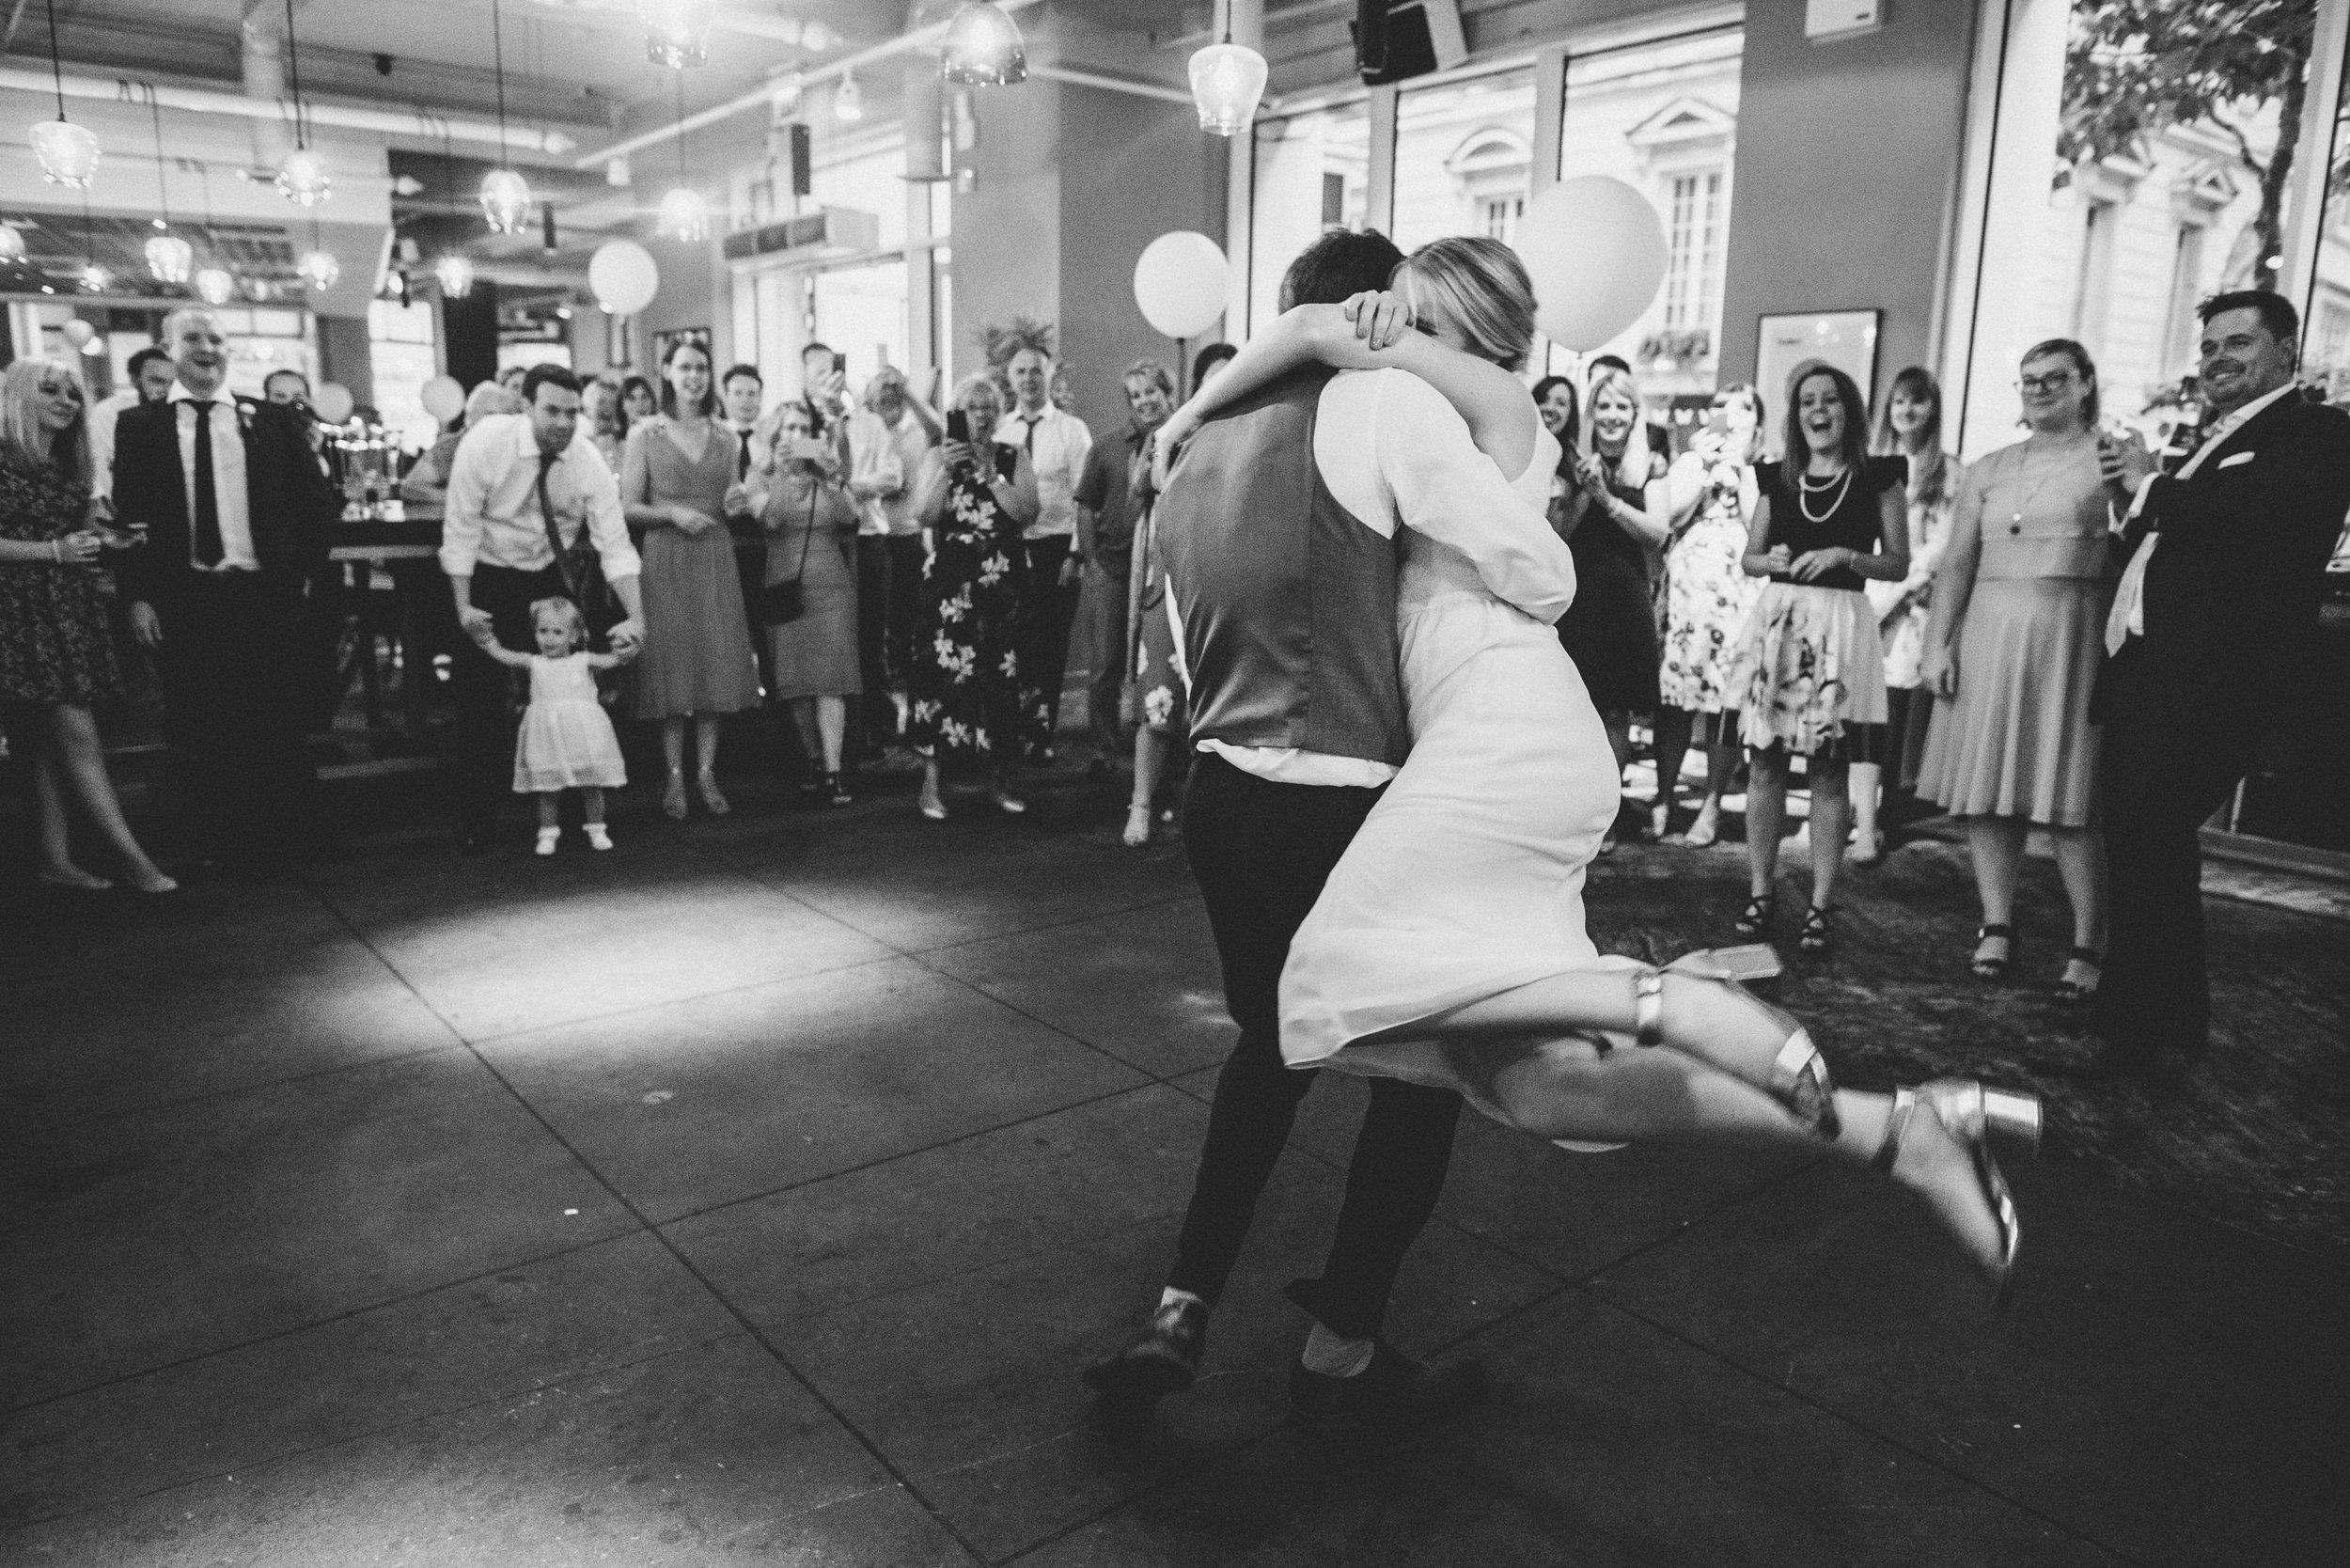 0231-LISA-DEVINE-PHOTOGRAPHY-ALTERNATIVE-WEDDING-PHOTOGRAPHY-SCOTLAND-DESTINATION-WEDDINGS-GLASGOW-WEDDINGS-COOL-WEDDINGS-STYLISH-WEDDINGS.JPG